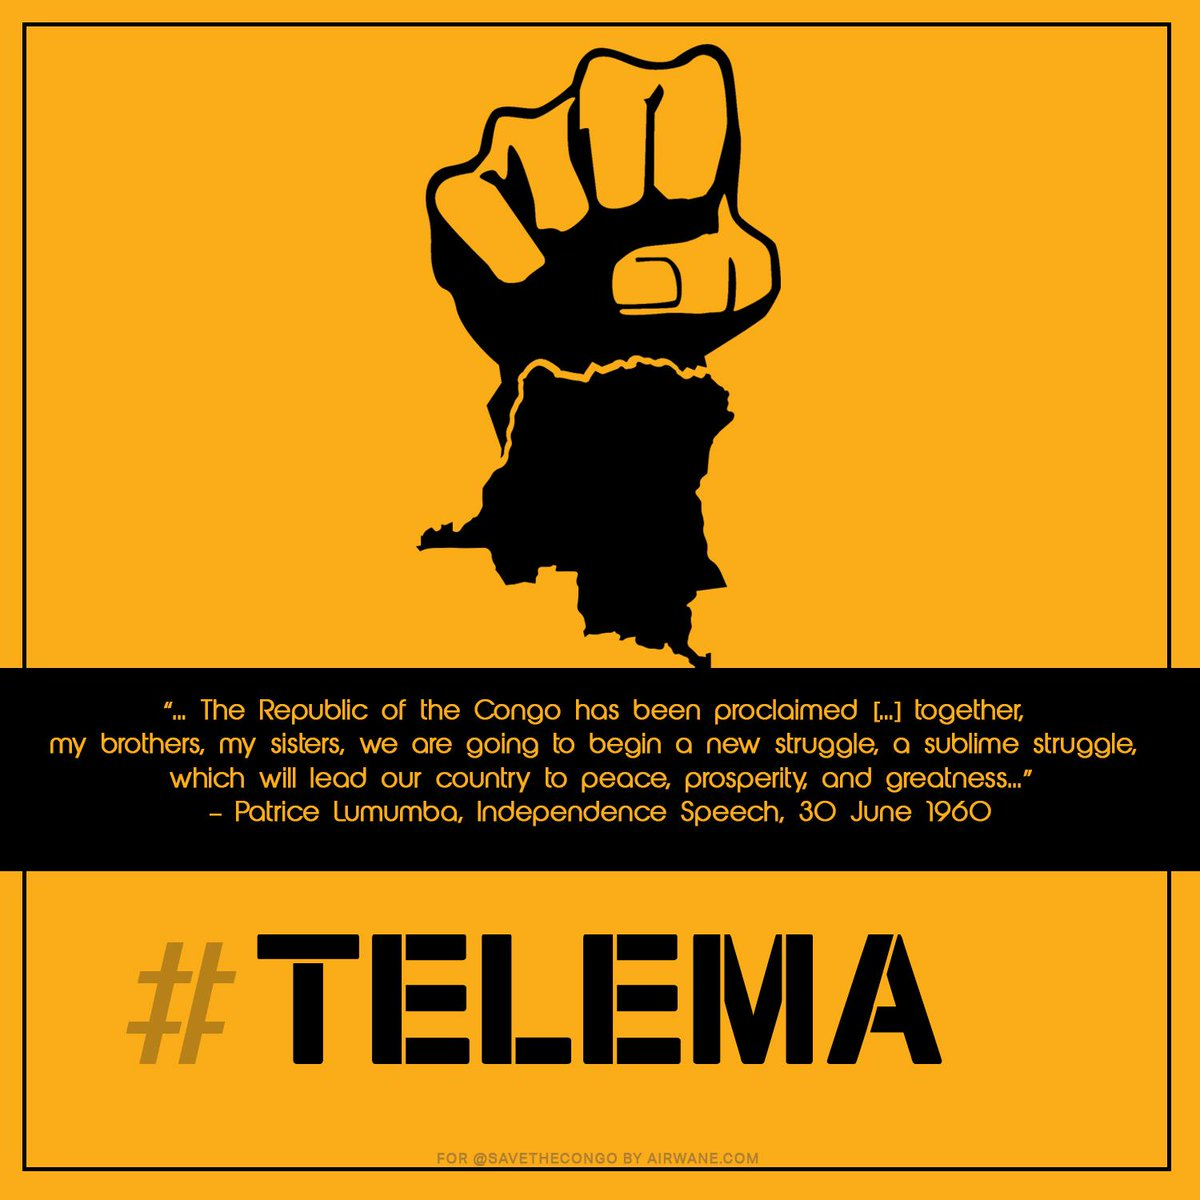 #Congo #RDC #ElokoYaMakasi #Telema http://t.co/7pmZbw7DMq